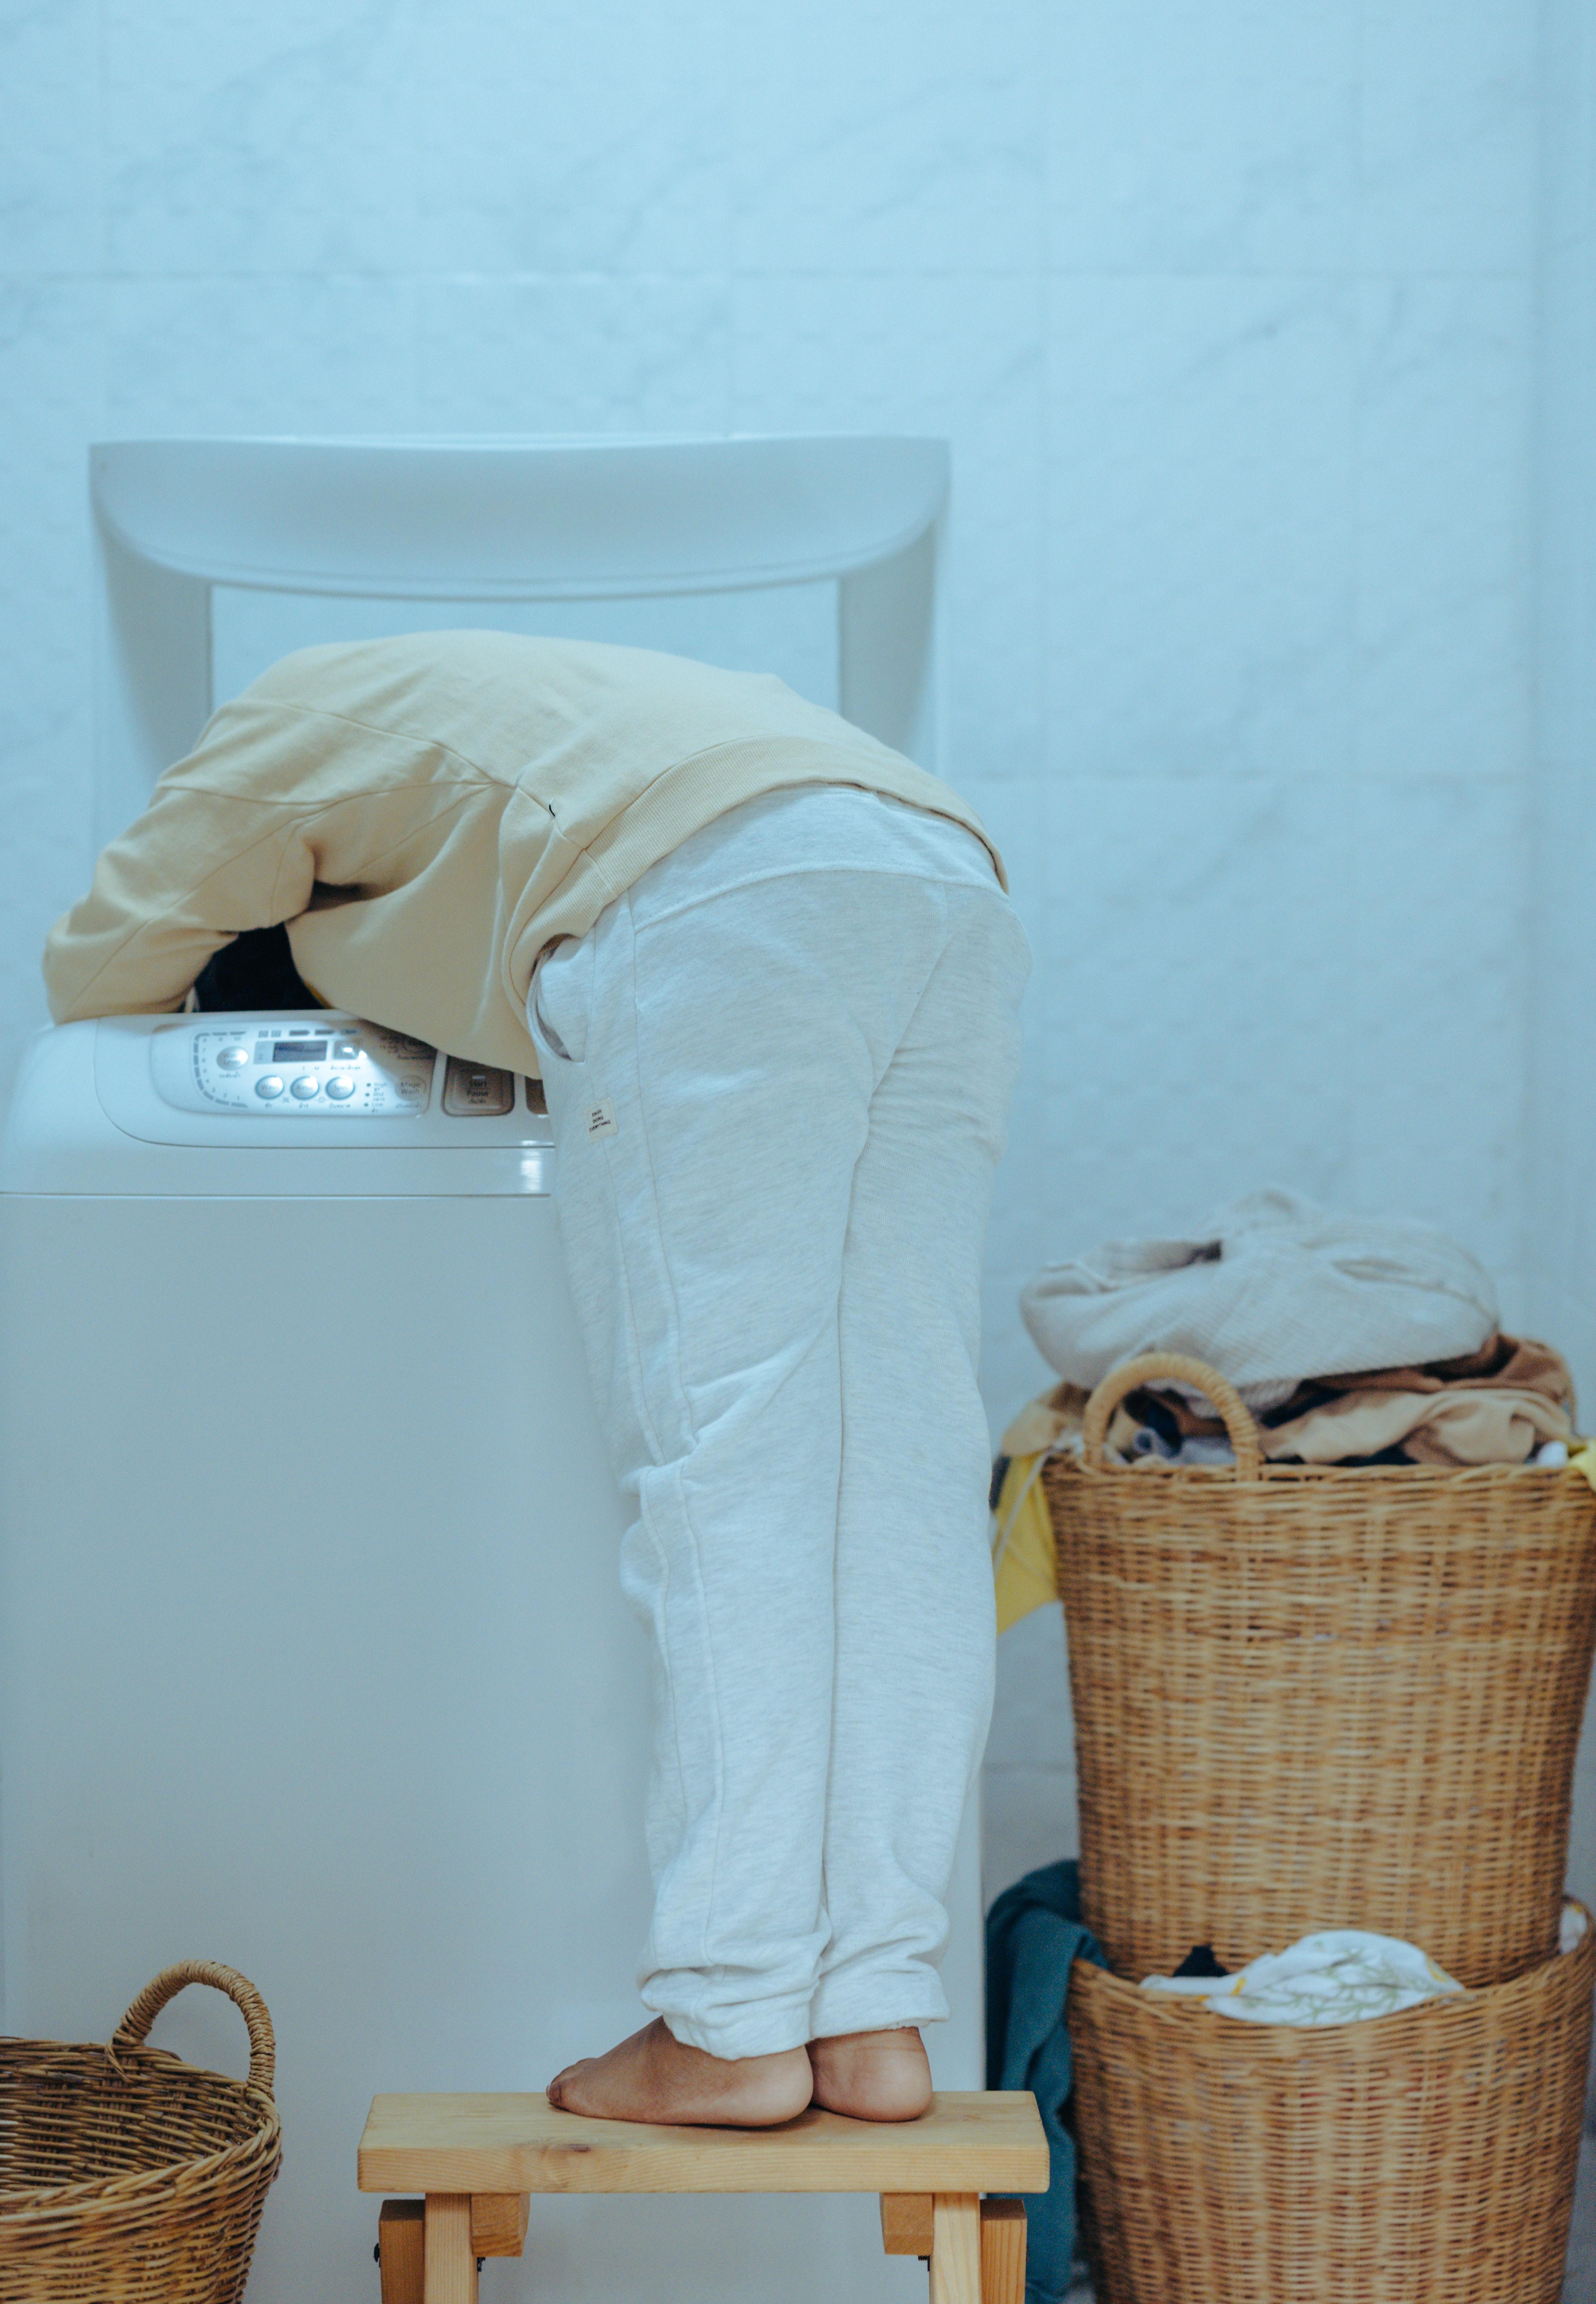 Waschmaschine anschließen